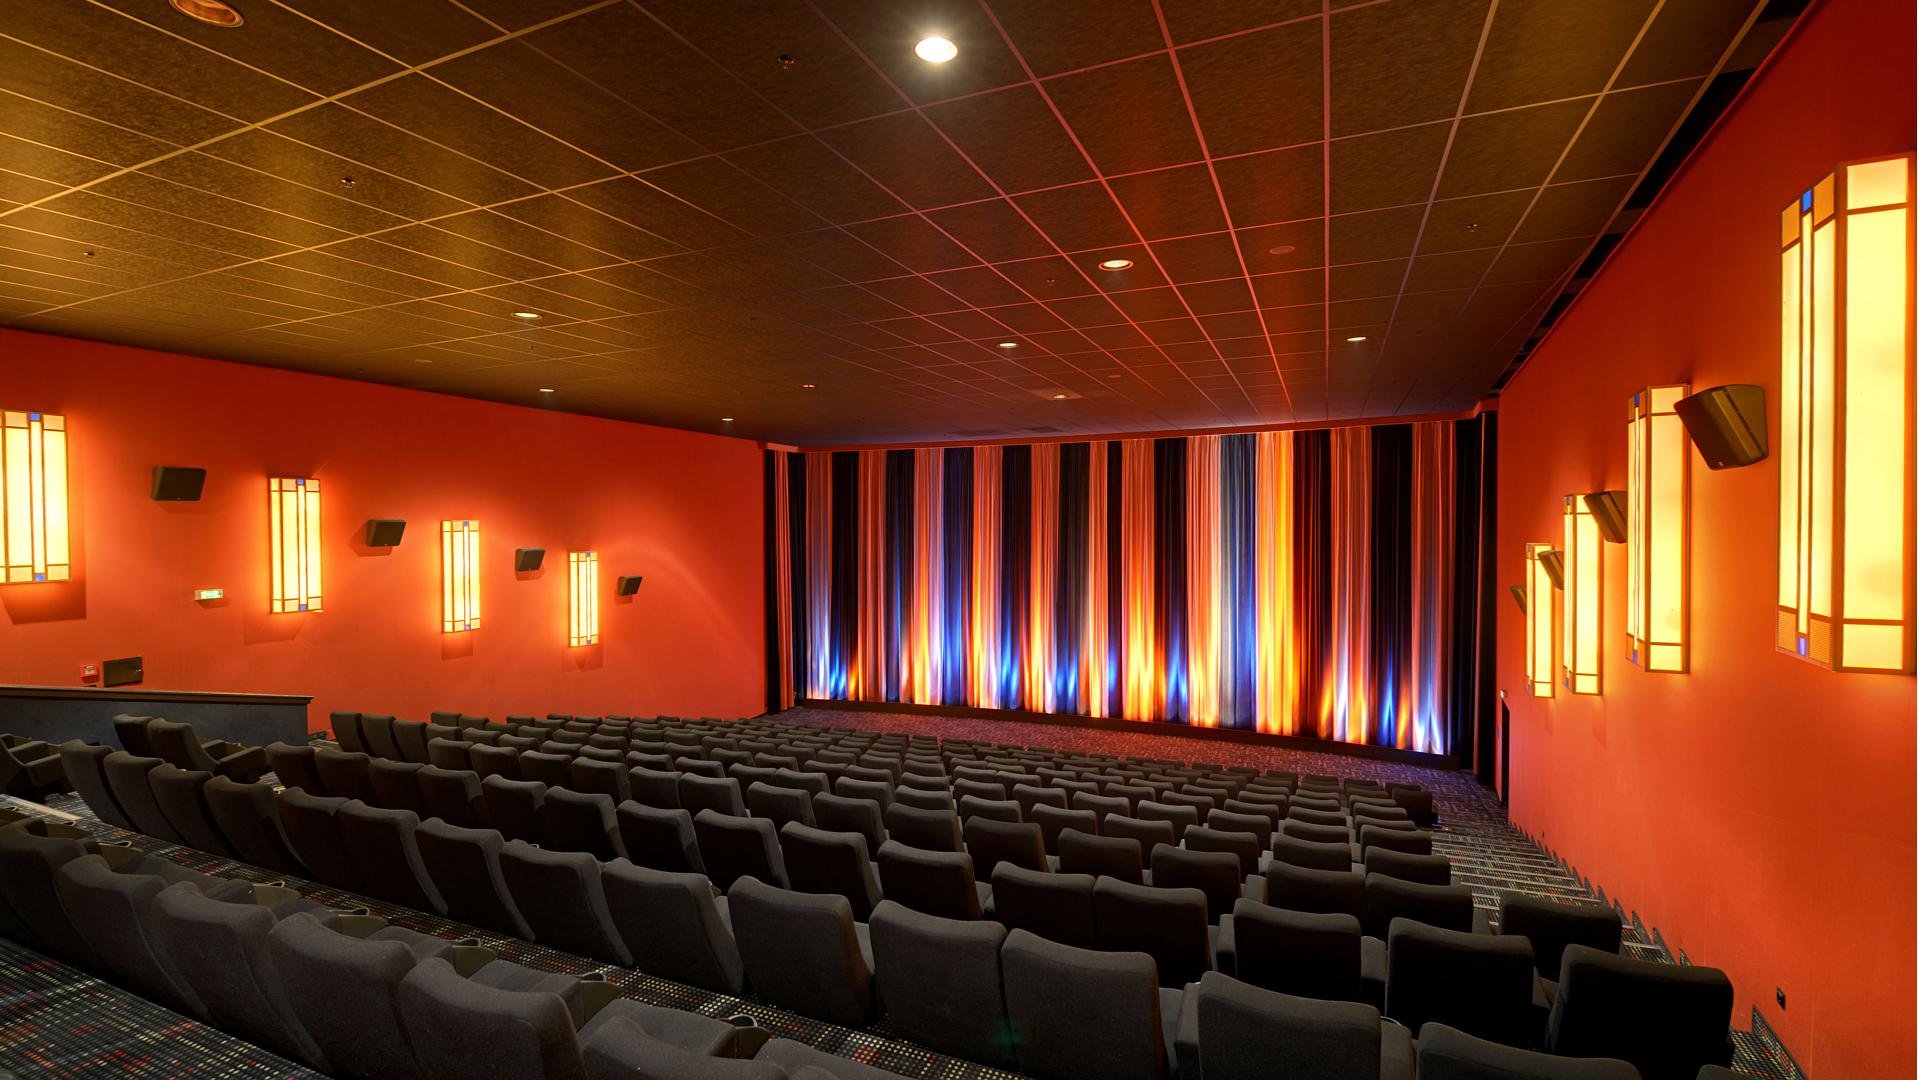 Cinestar Wiesbaden